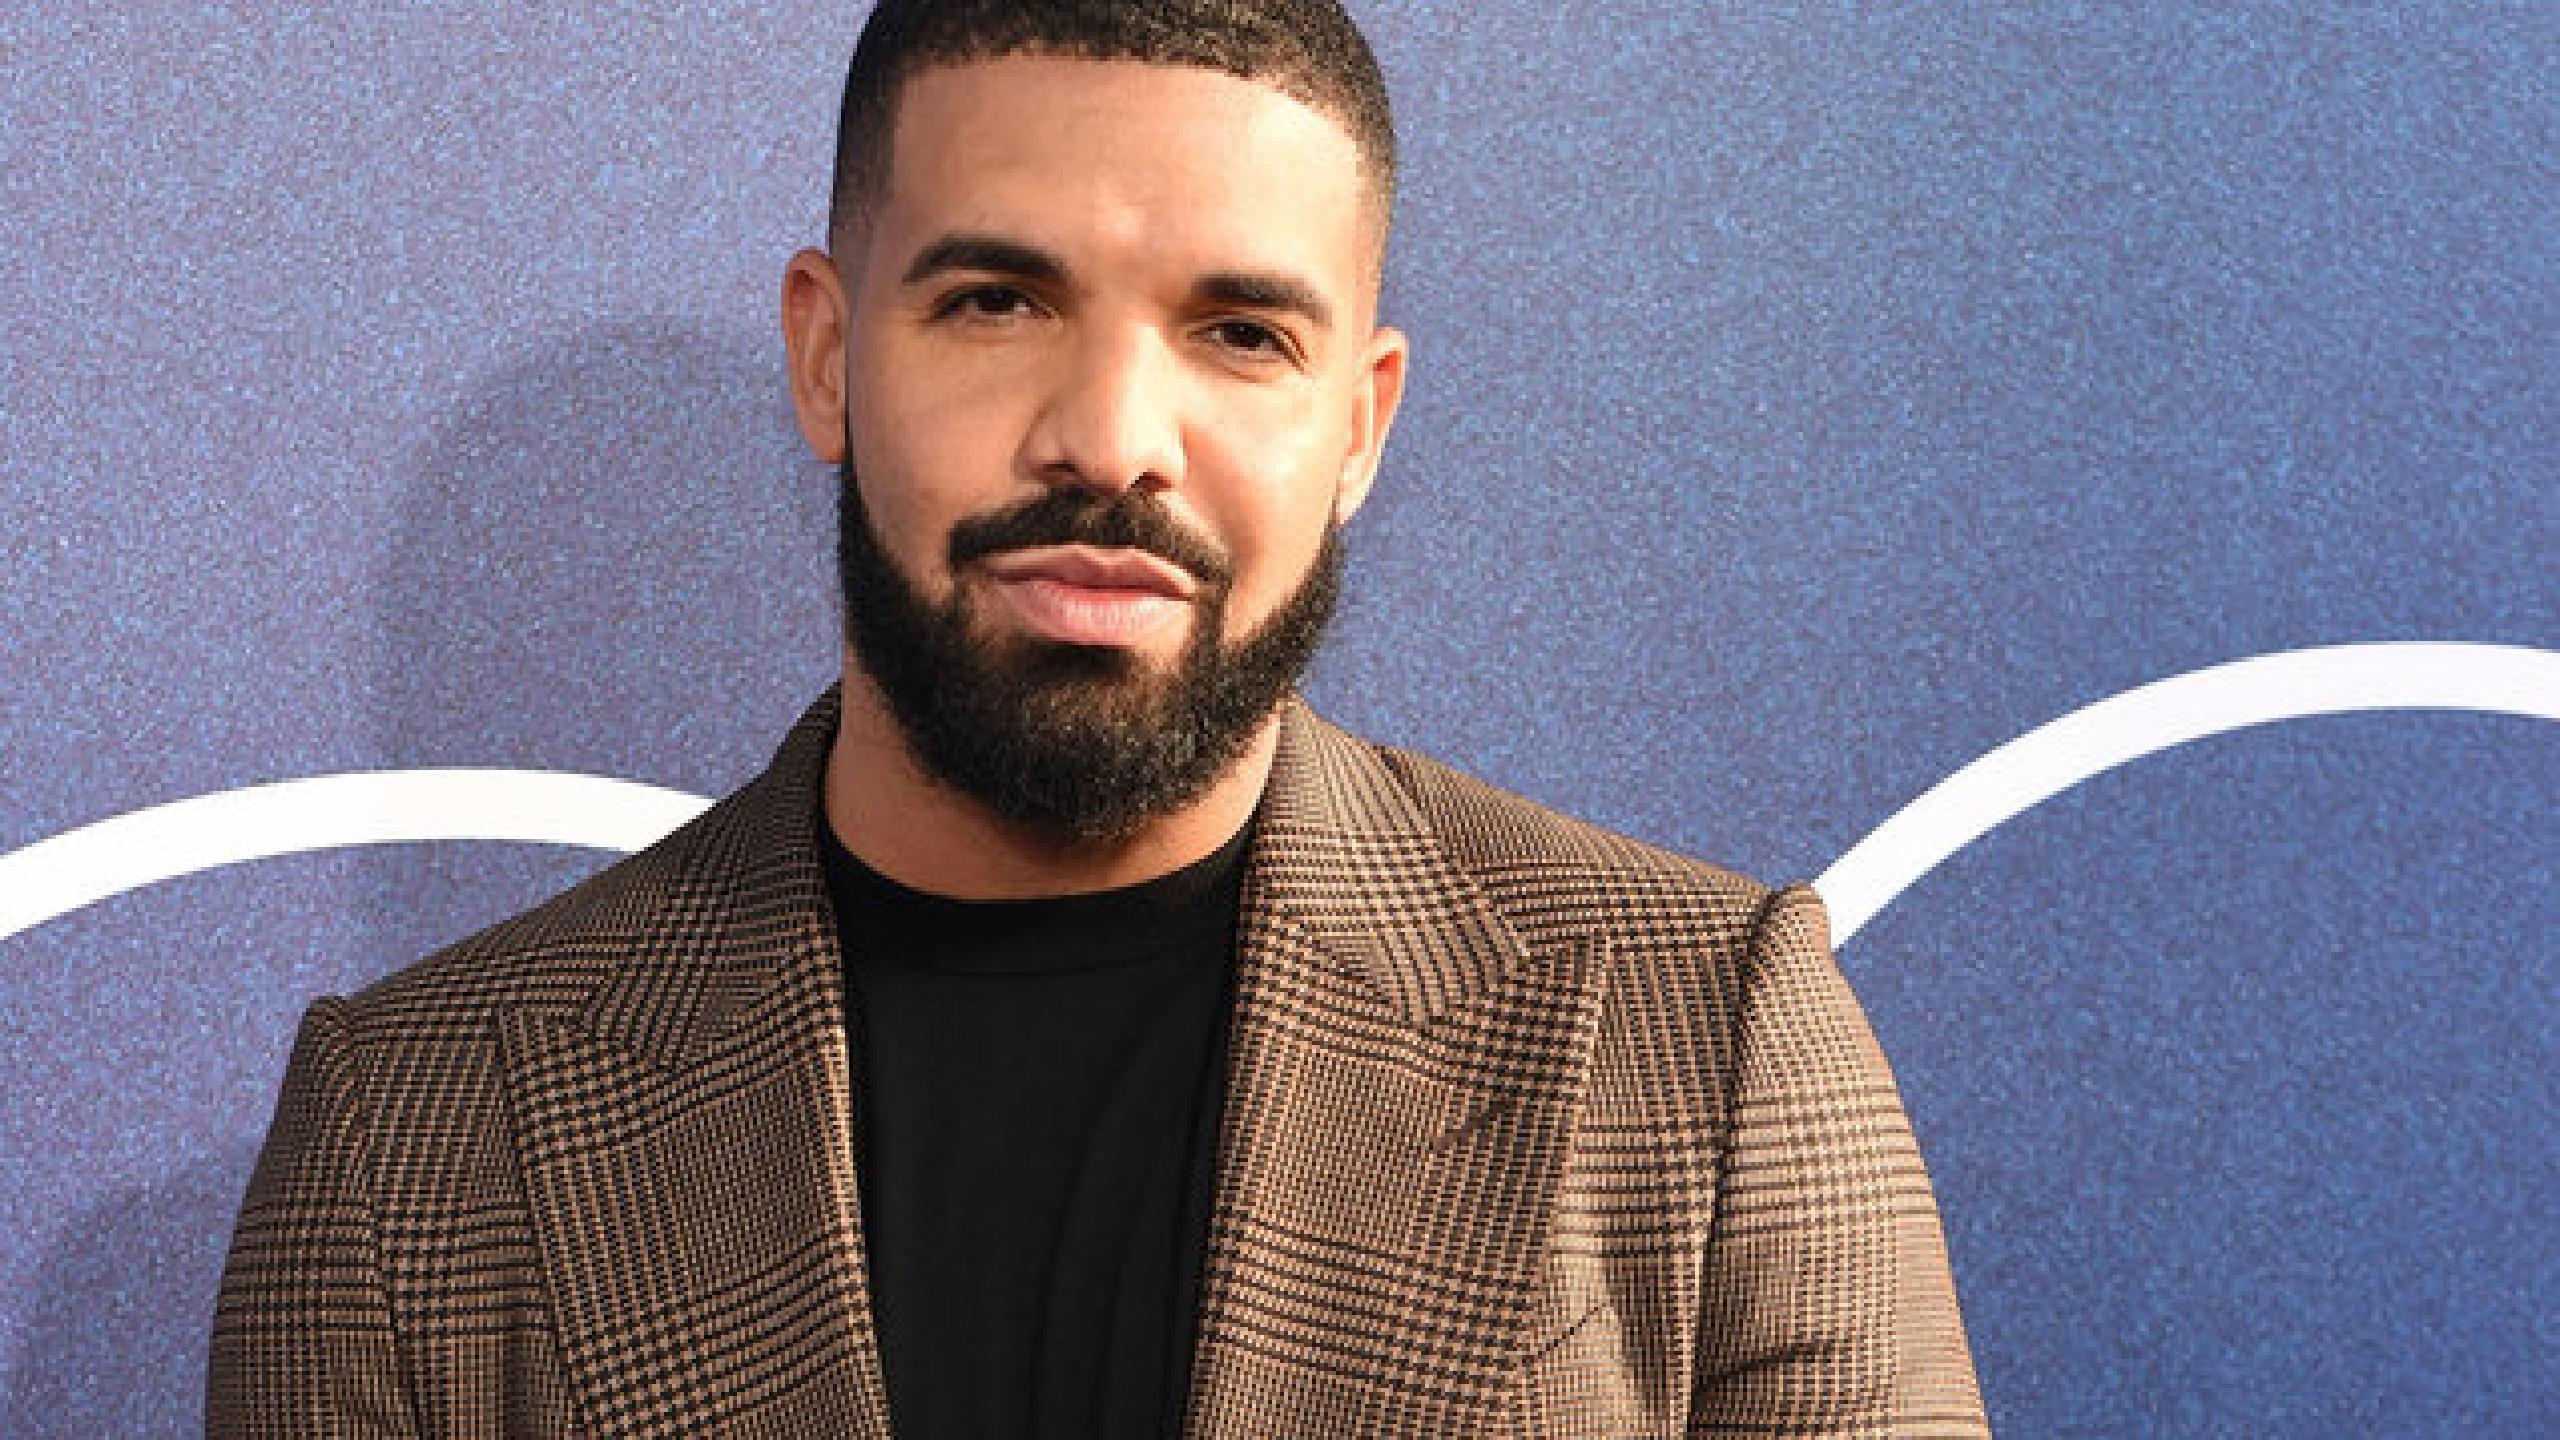 Drake New Album 2020.Drake Tour Dates 2019 2020 Drake Tickets And Concerts Wegow